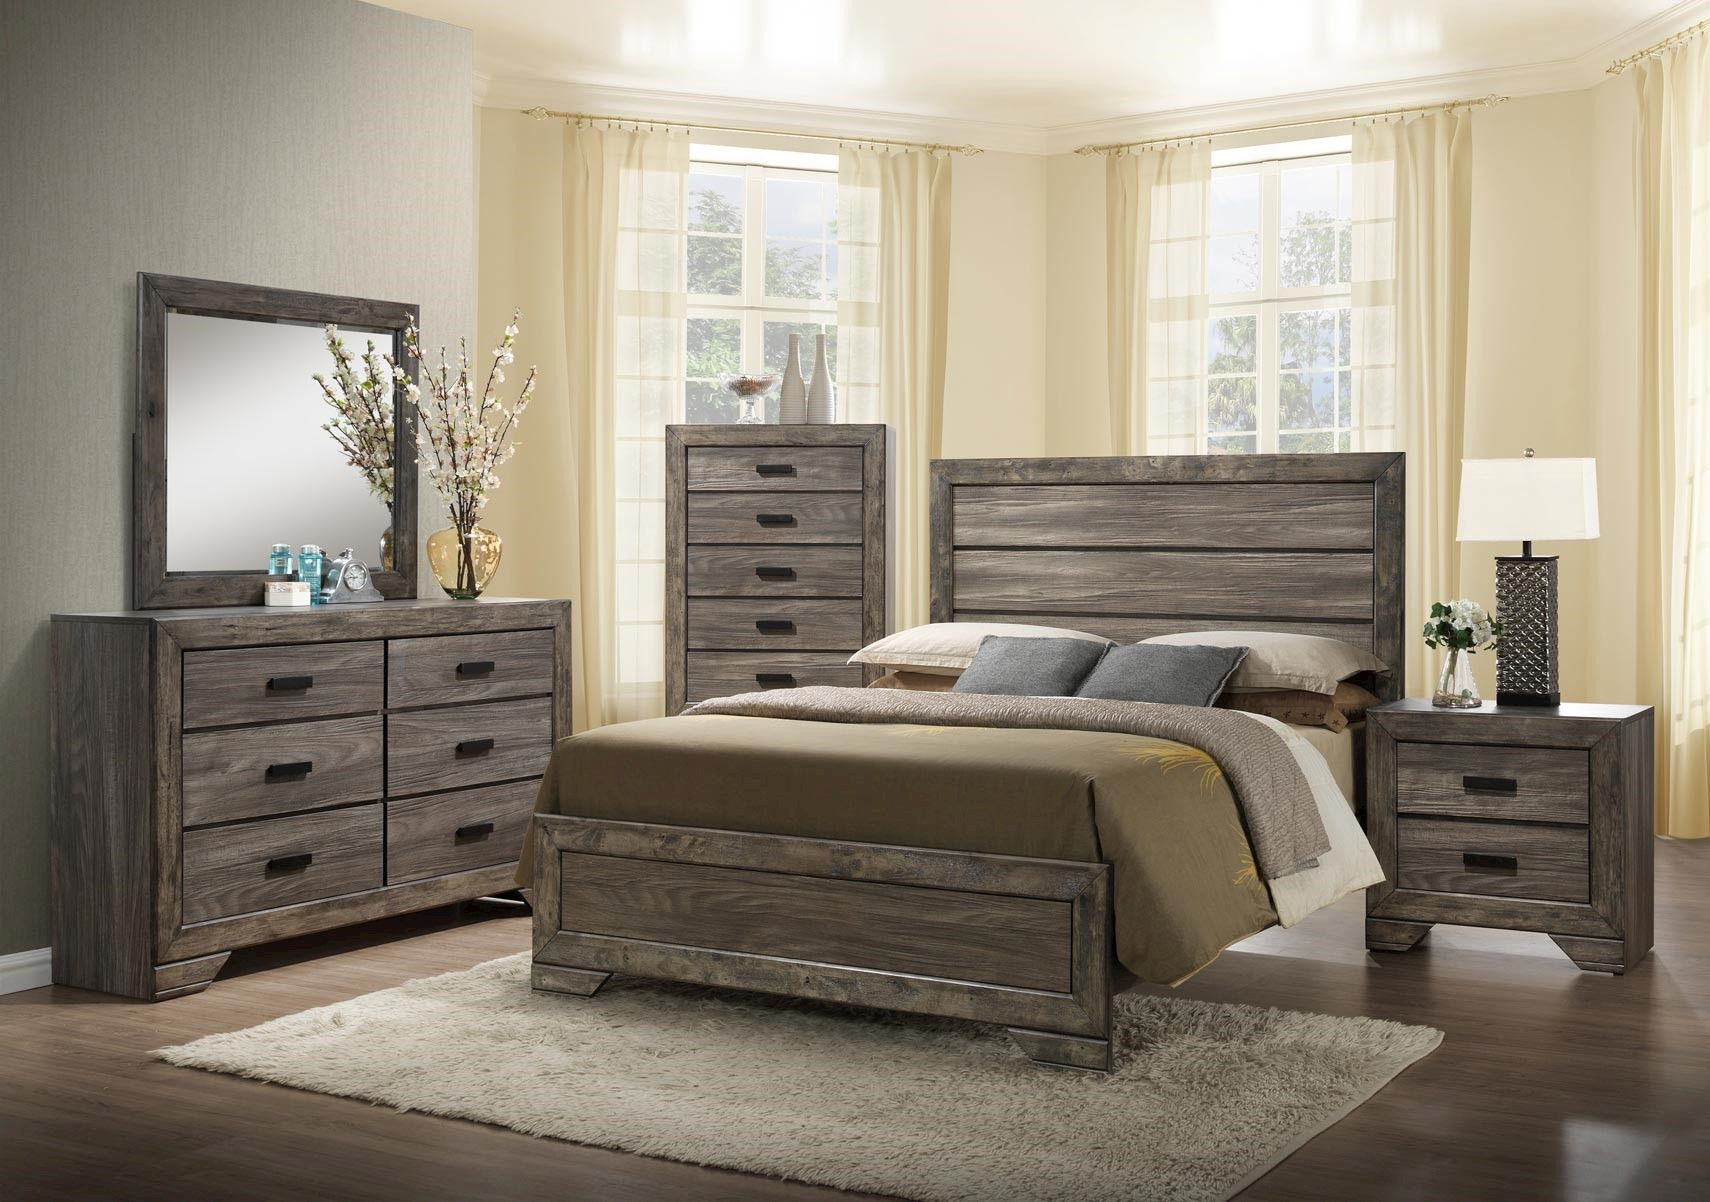 Lacks Nathan 4 Pc Queen Bedroom Set Bedroom Sets Queen Bedroom Furniture Sets Bedroom Sets